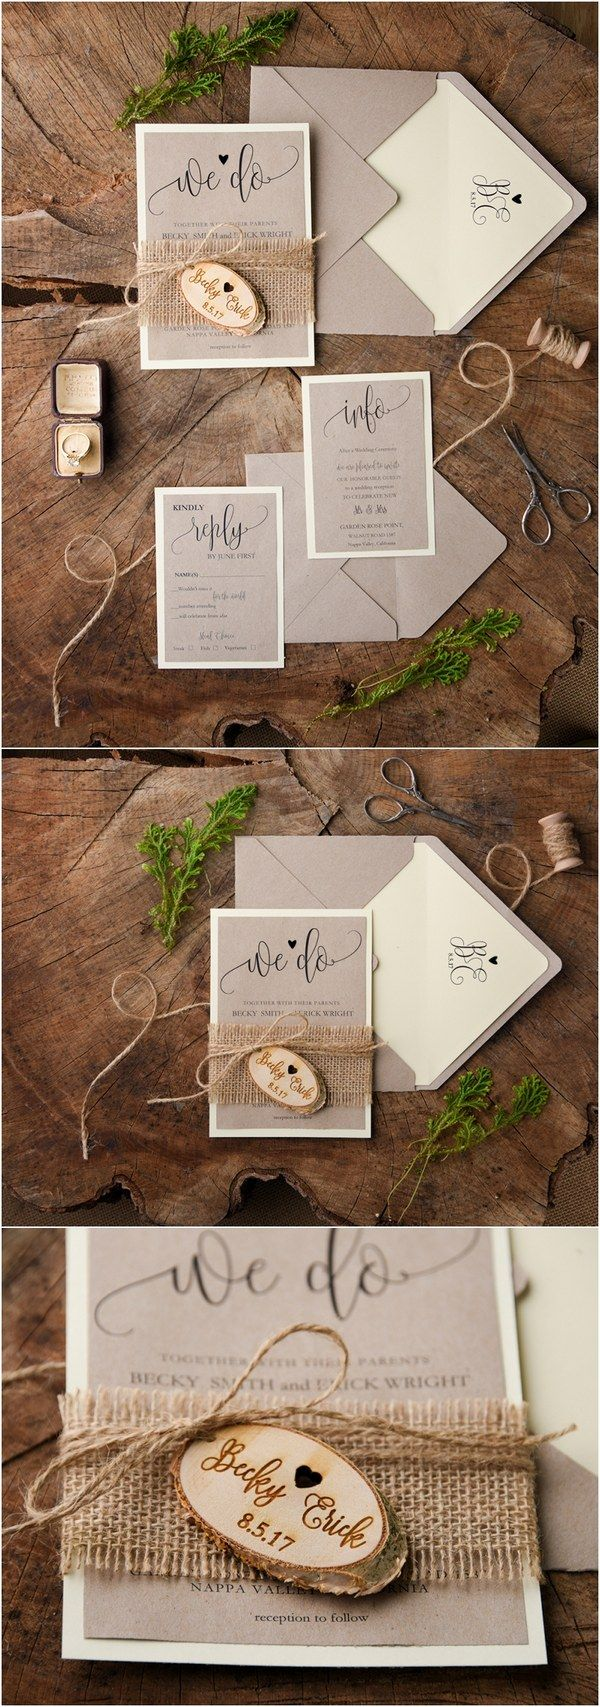 Rustic burlap and real wood wedding invitations @4LOVEPolkaDots